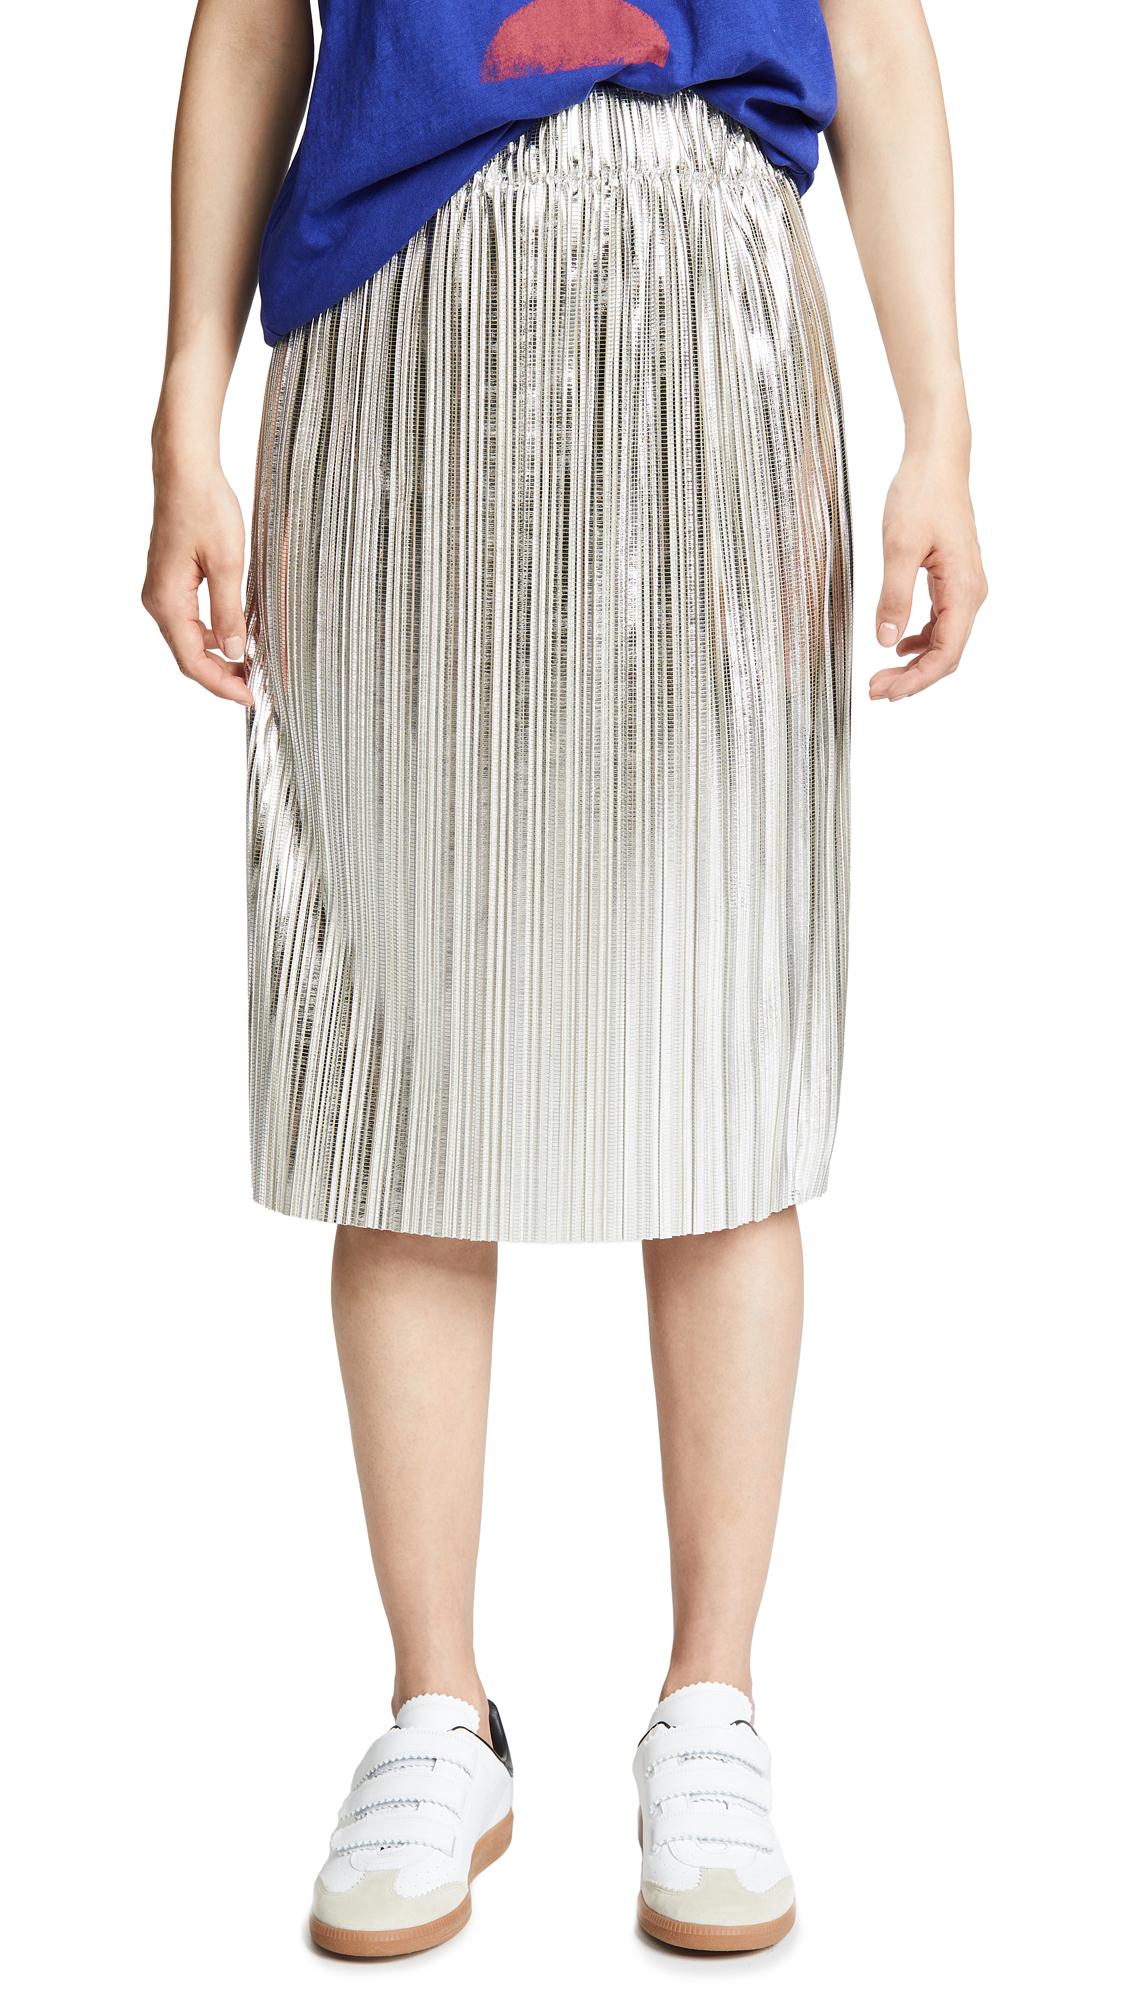 Isabel Marant Etoile Delphina Skirt In Silver